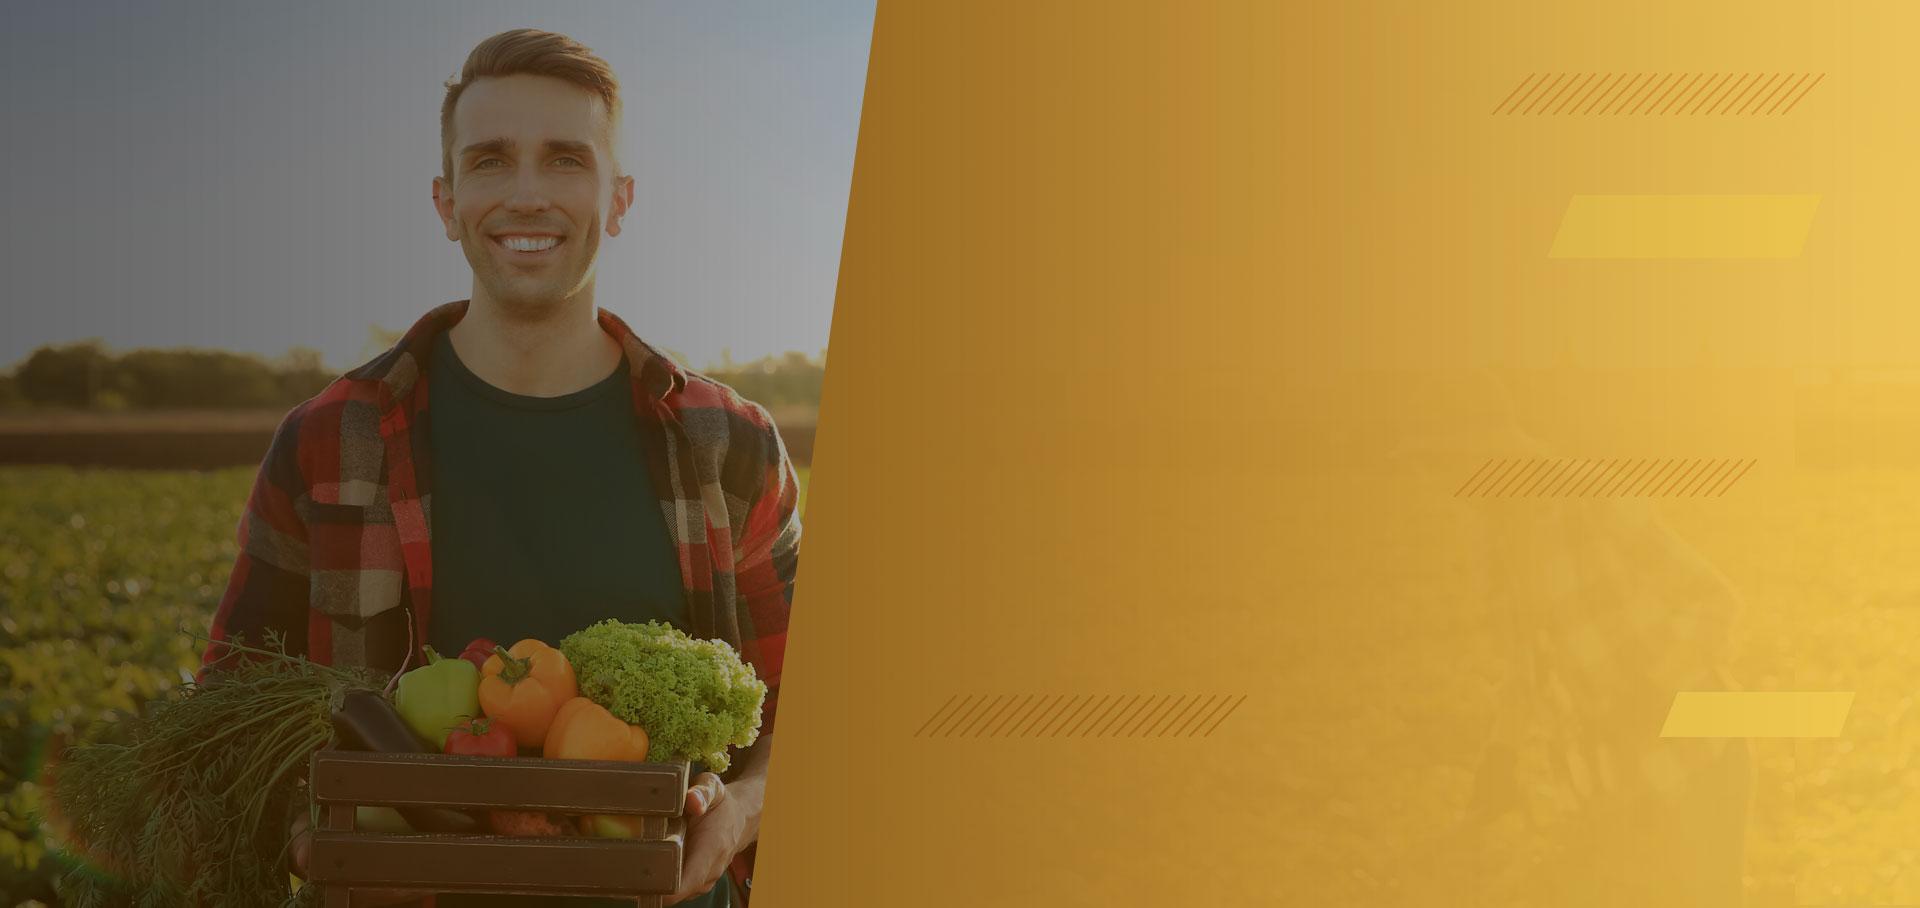 about organic farming